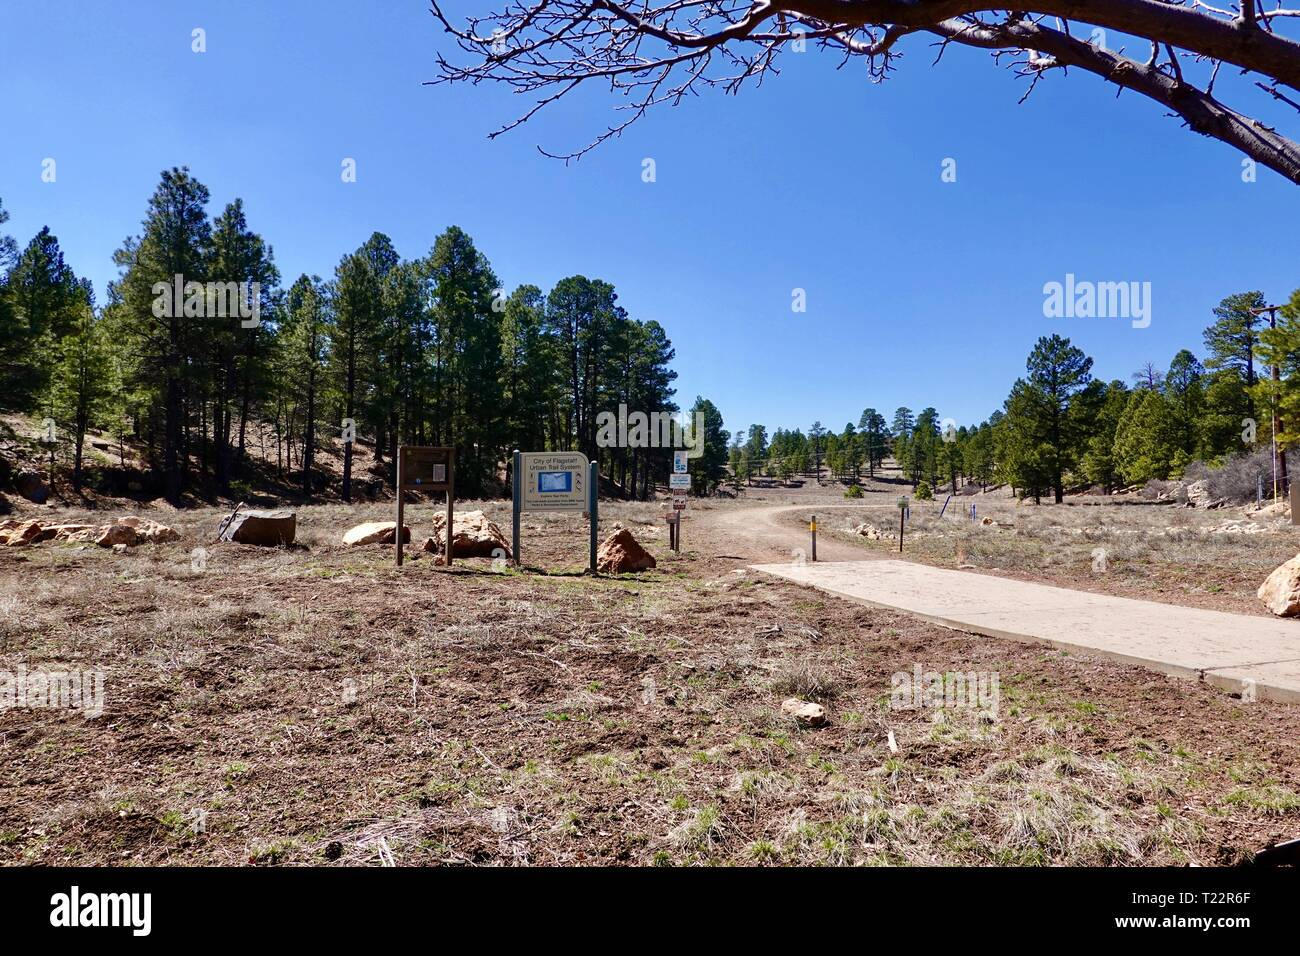 City of Flagstaff, Arizona hiking trail, Urban Train System at Foxglenn Park, Flagstaff, Arizona, USA - Stock Image